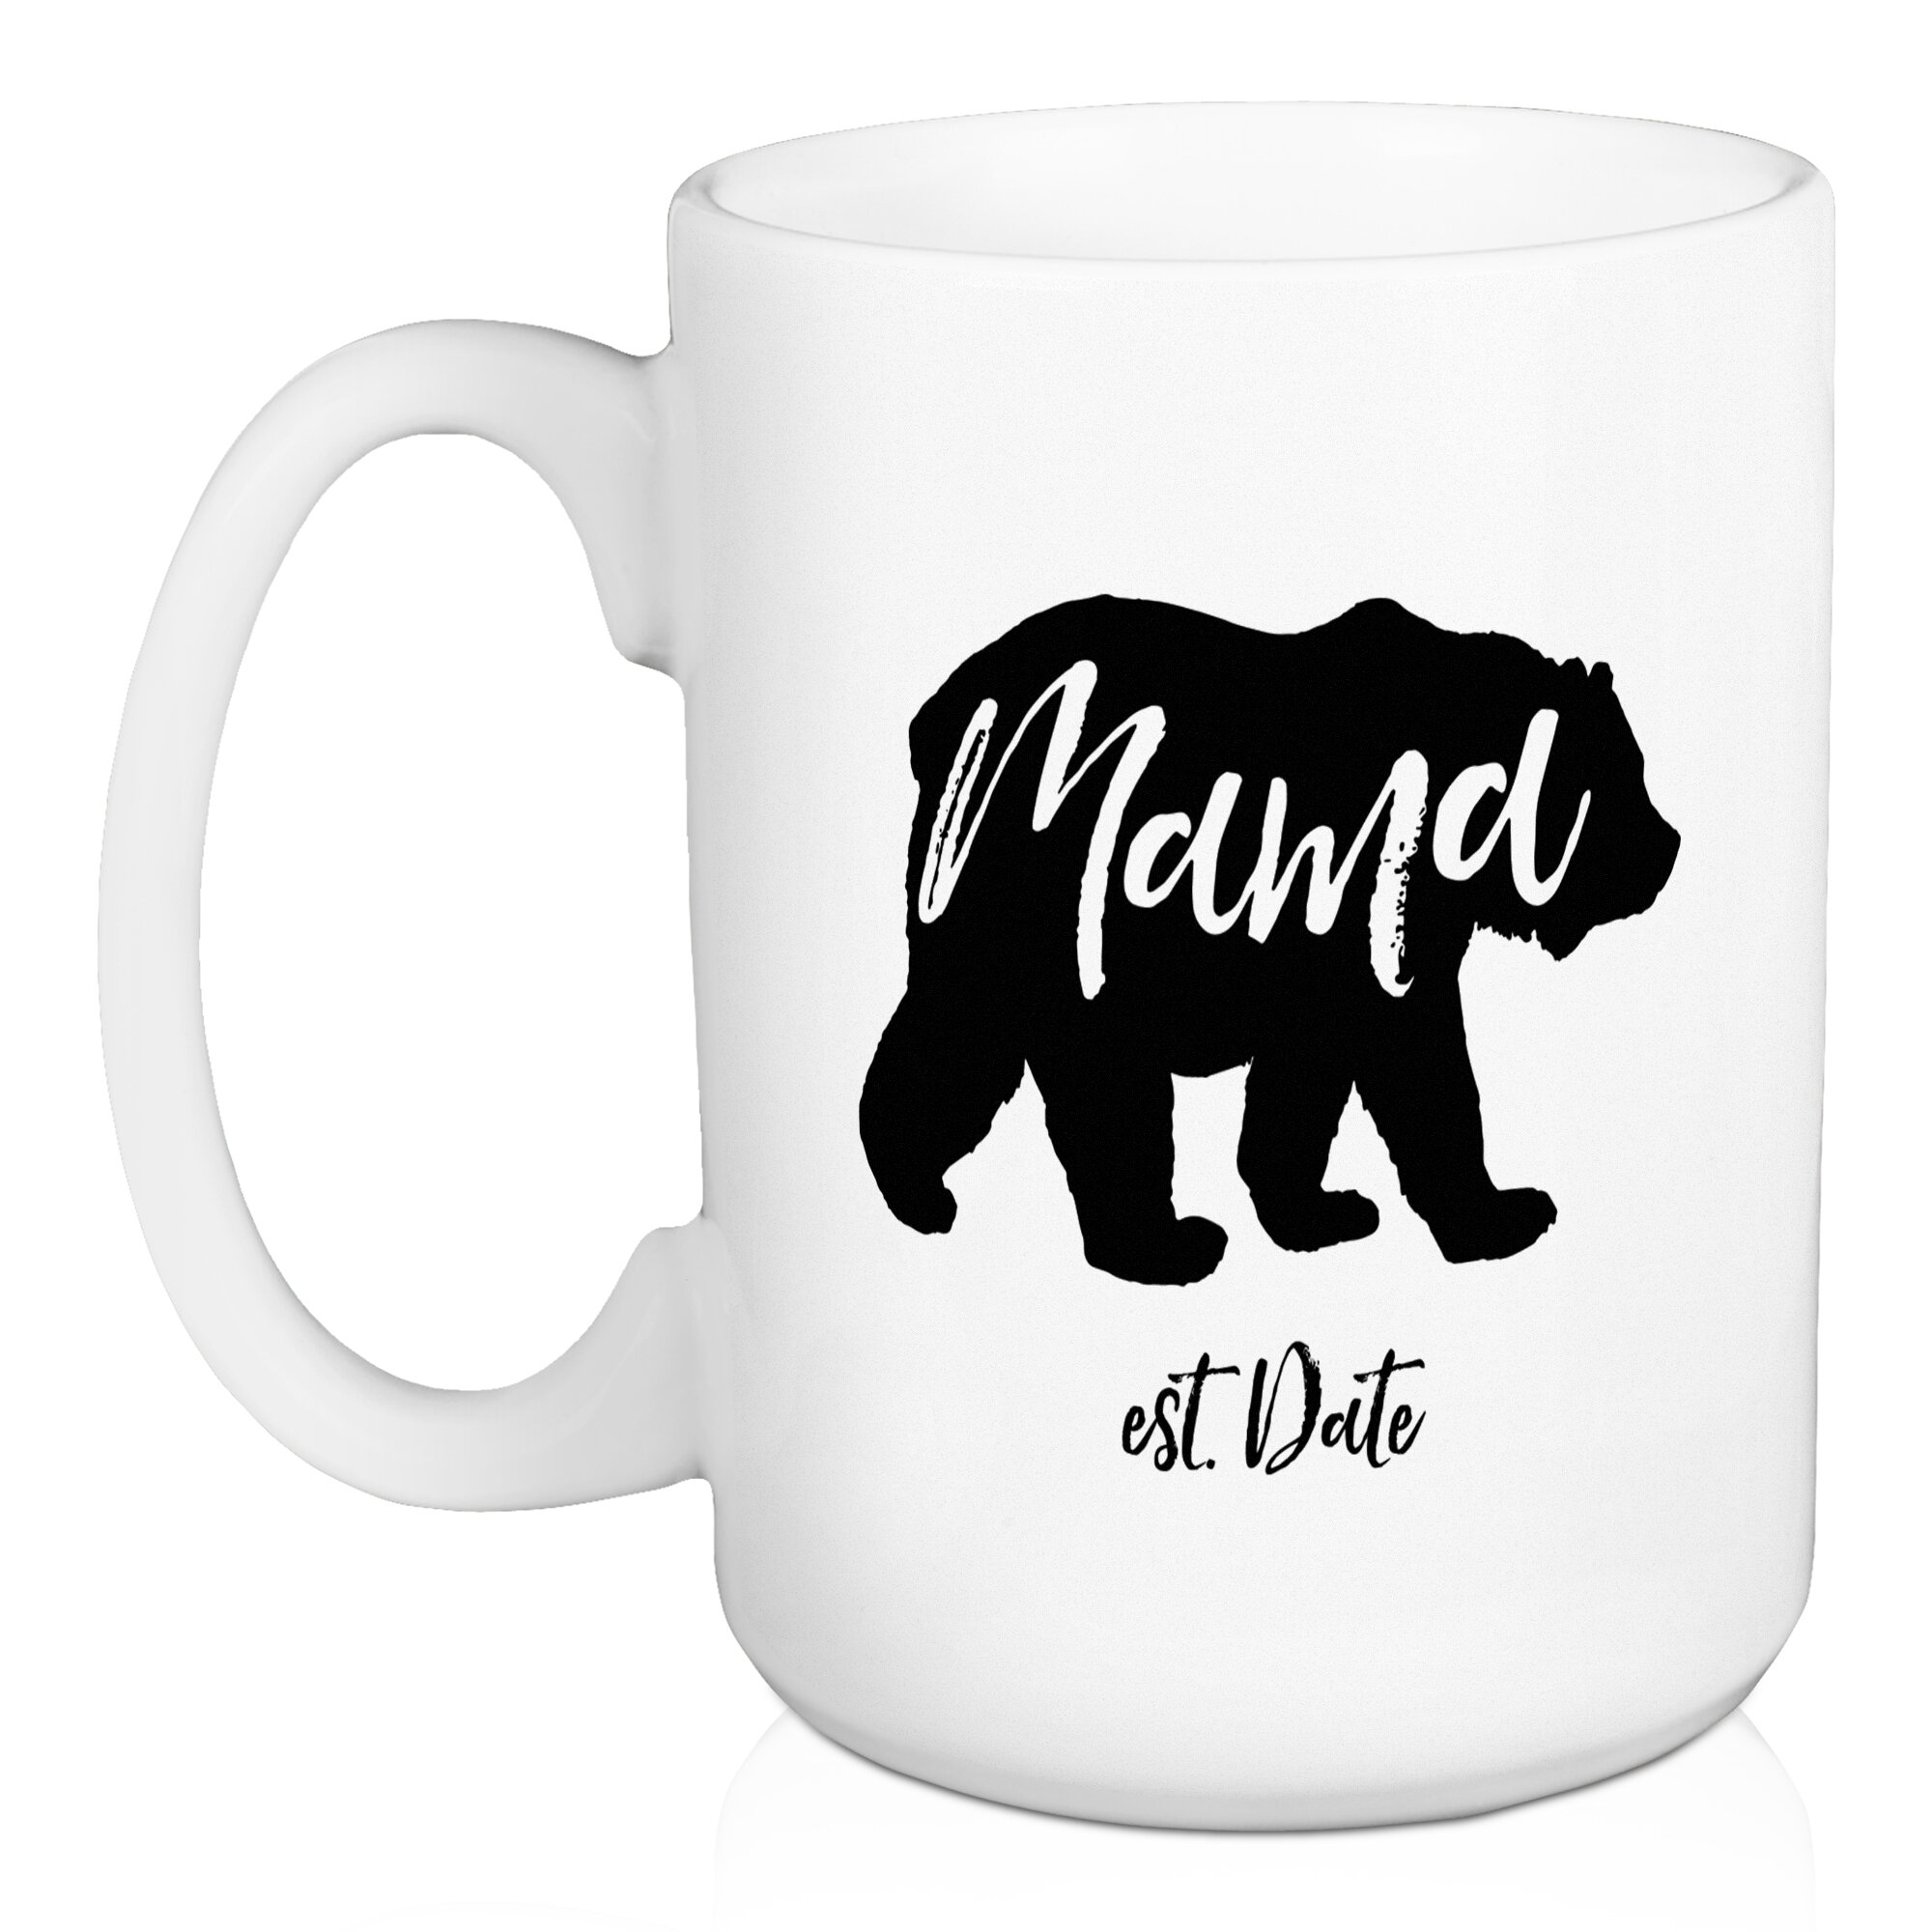 cbd534ef7d Loon Peak Pagel Mama Bear Personalized Coffee Mug   Wayfair